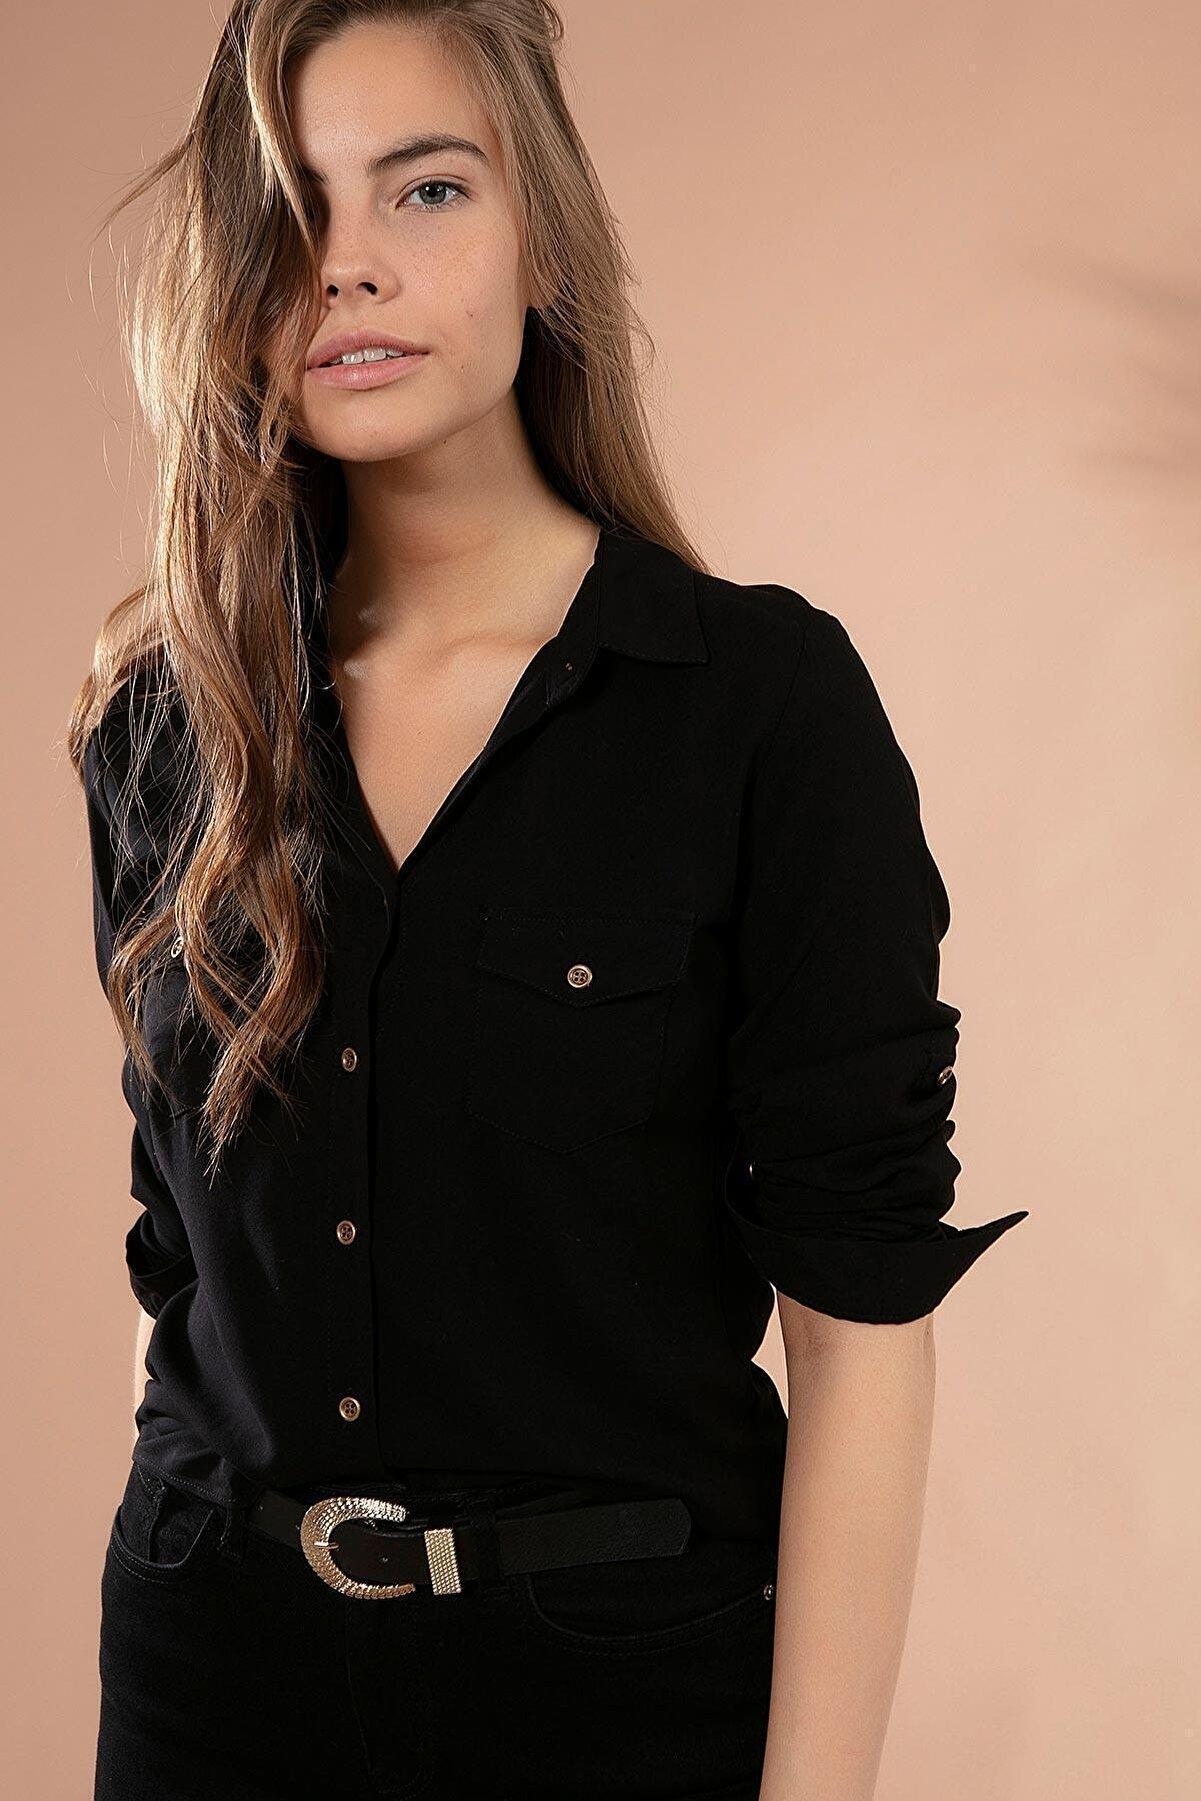 Pattaya Kadın Cep Detaylı Basic Uzun Kollu Gömlek Y19w110-3428